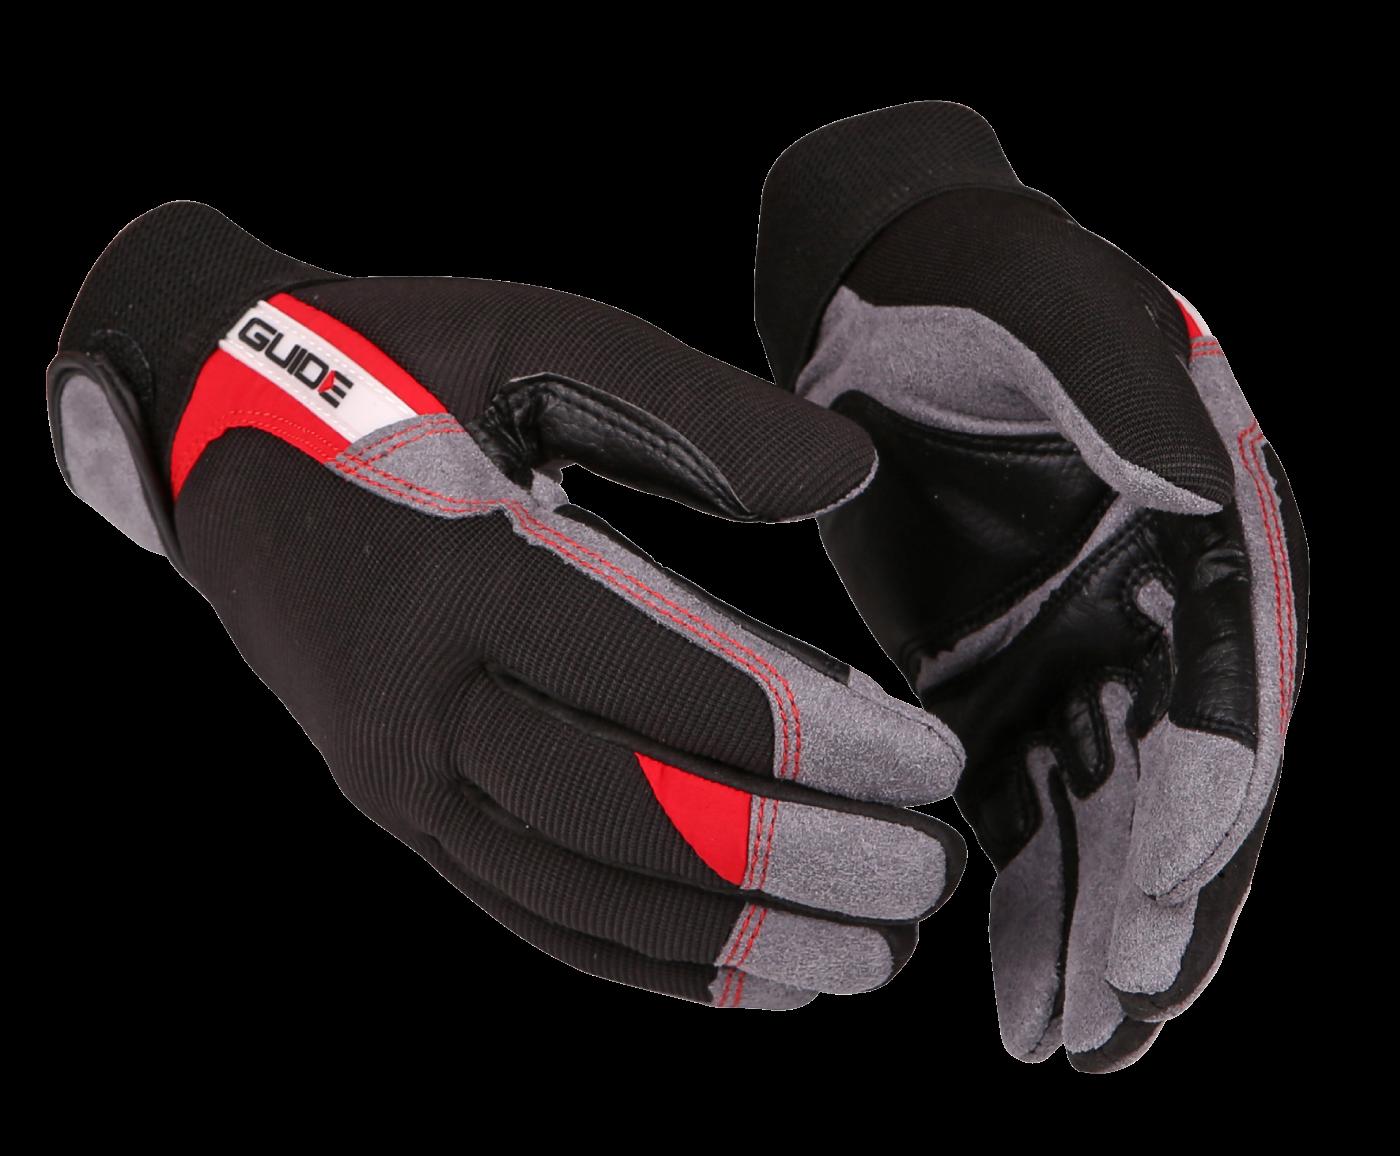 Heavyweight Working Glove GUIDE 5010